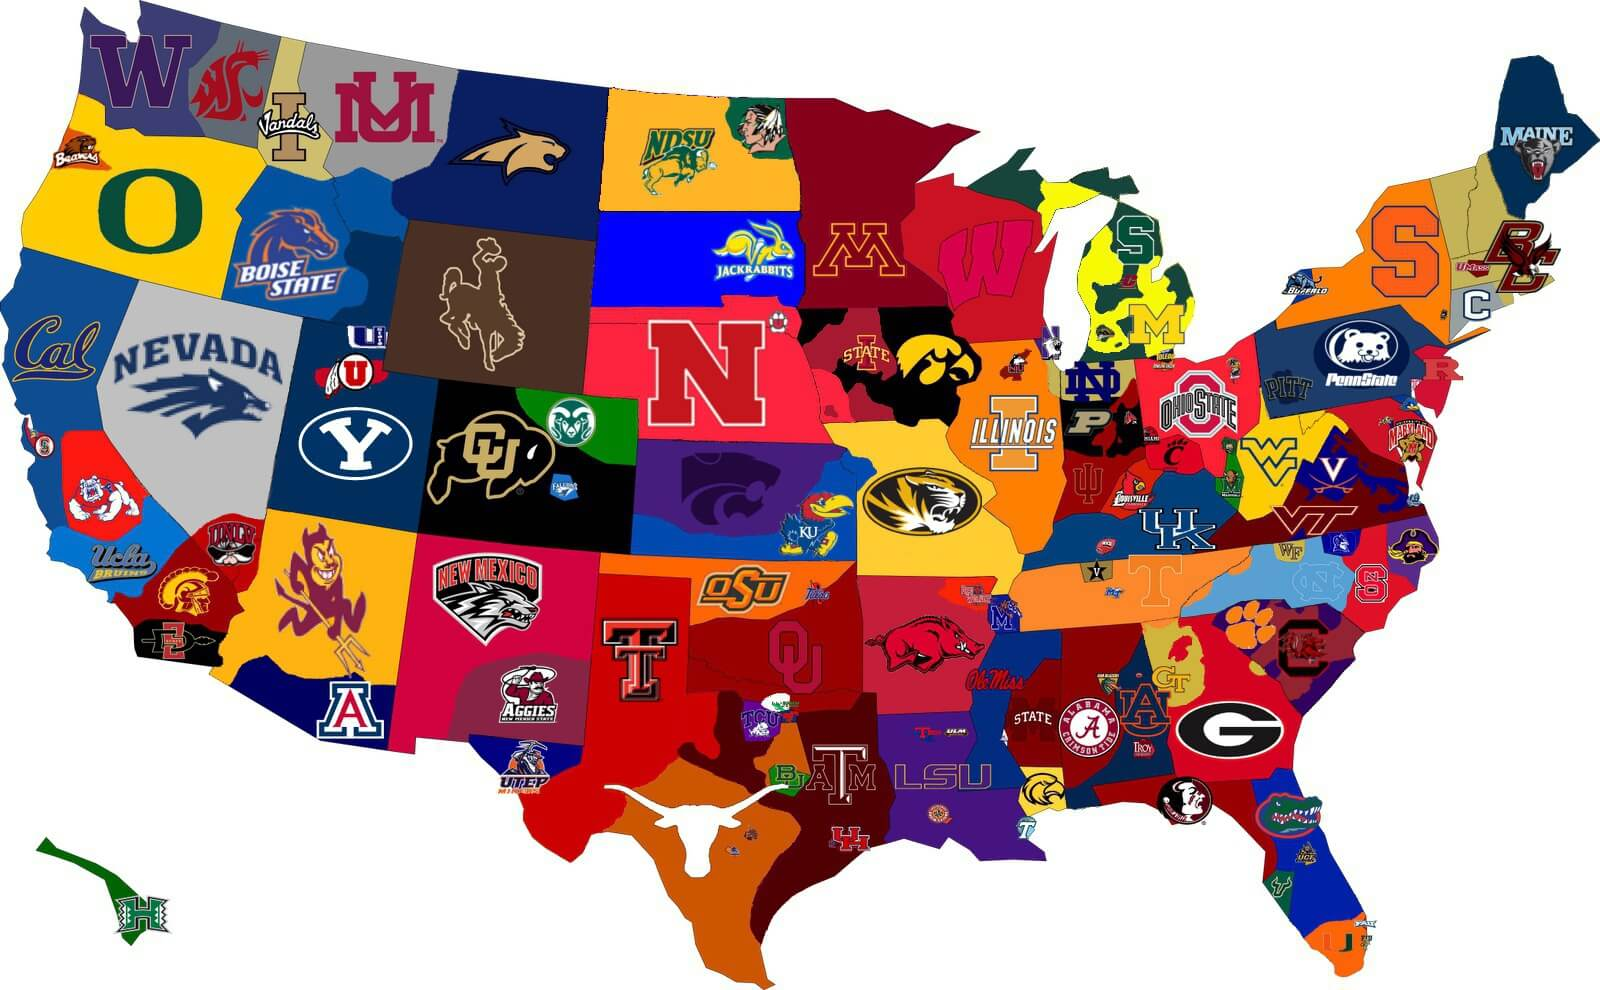 NCAA FOOTBALL RANKINGS MAP